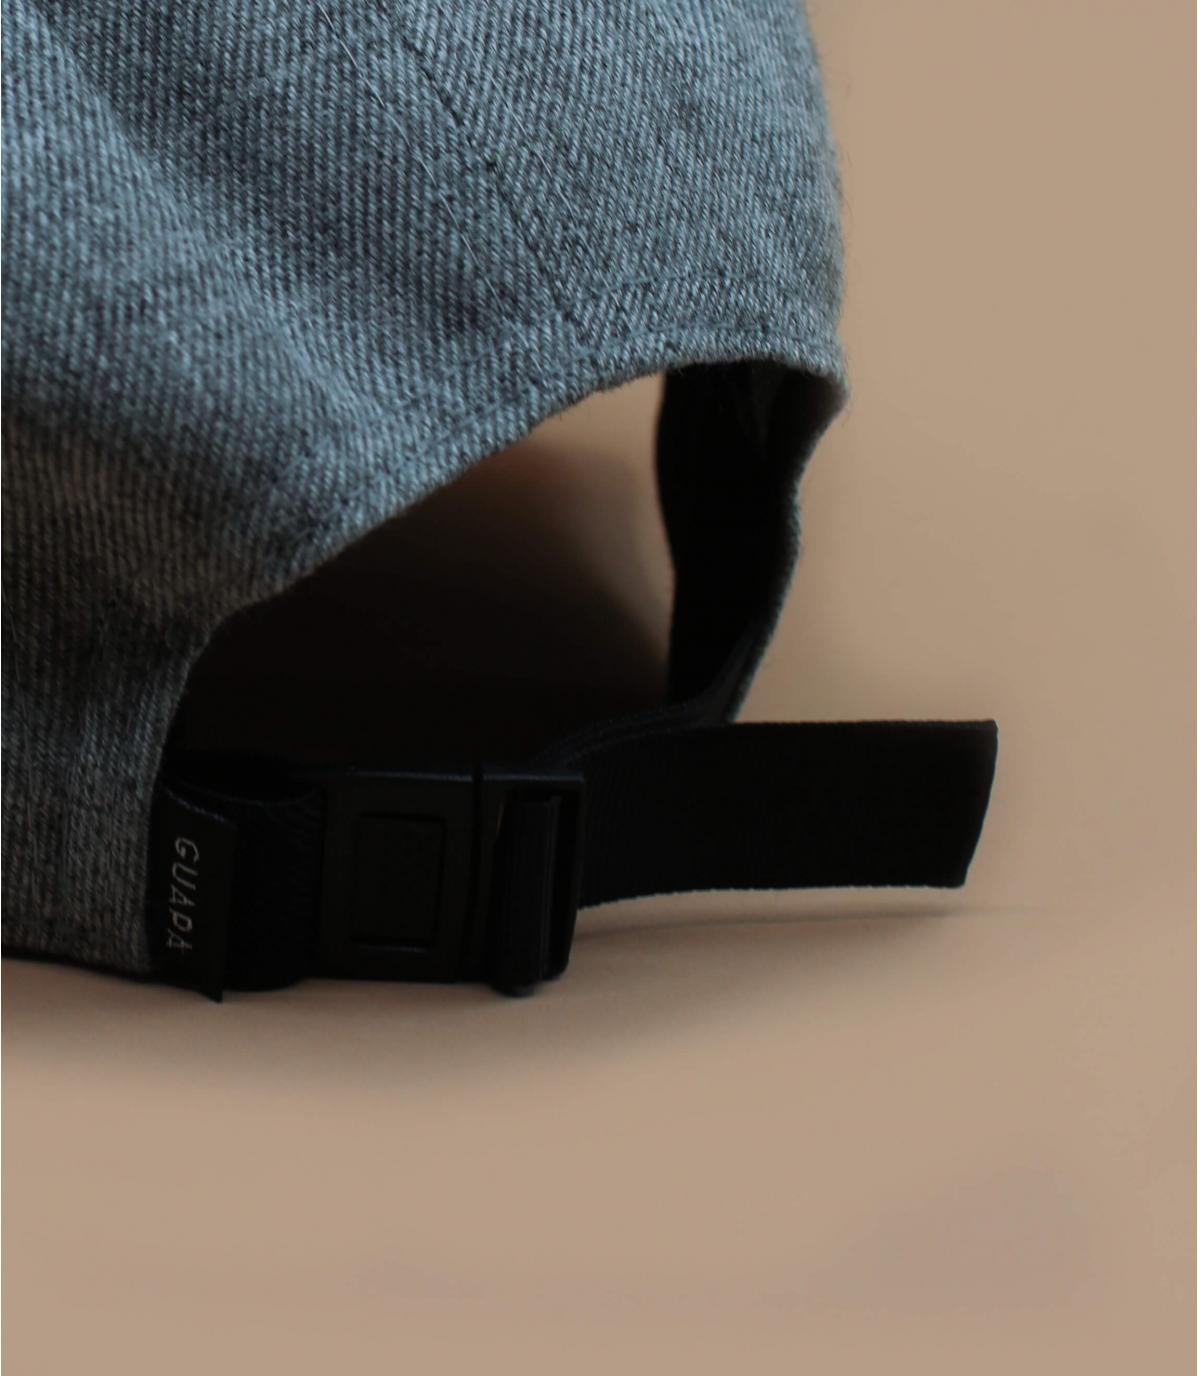 Dettagli Volley 5 Panel heather grey - image 4